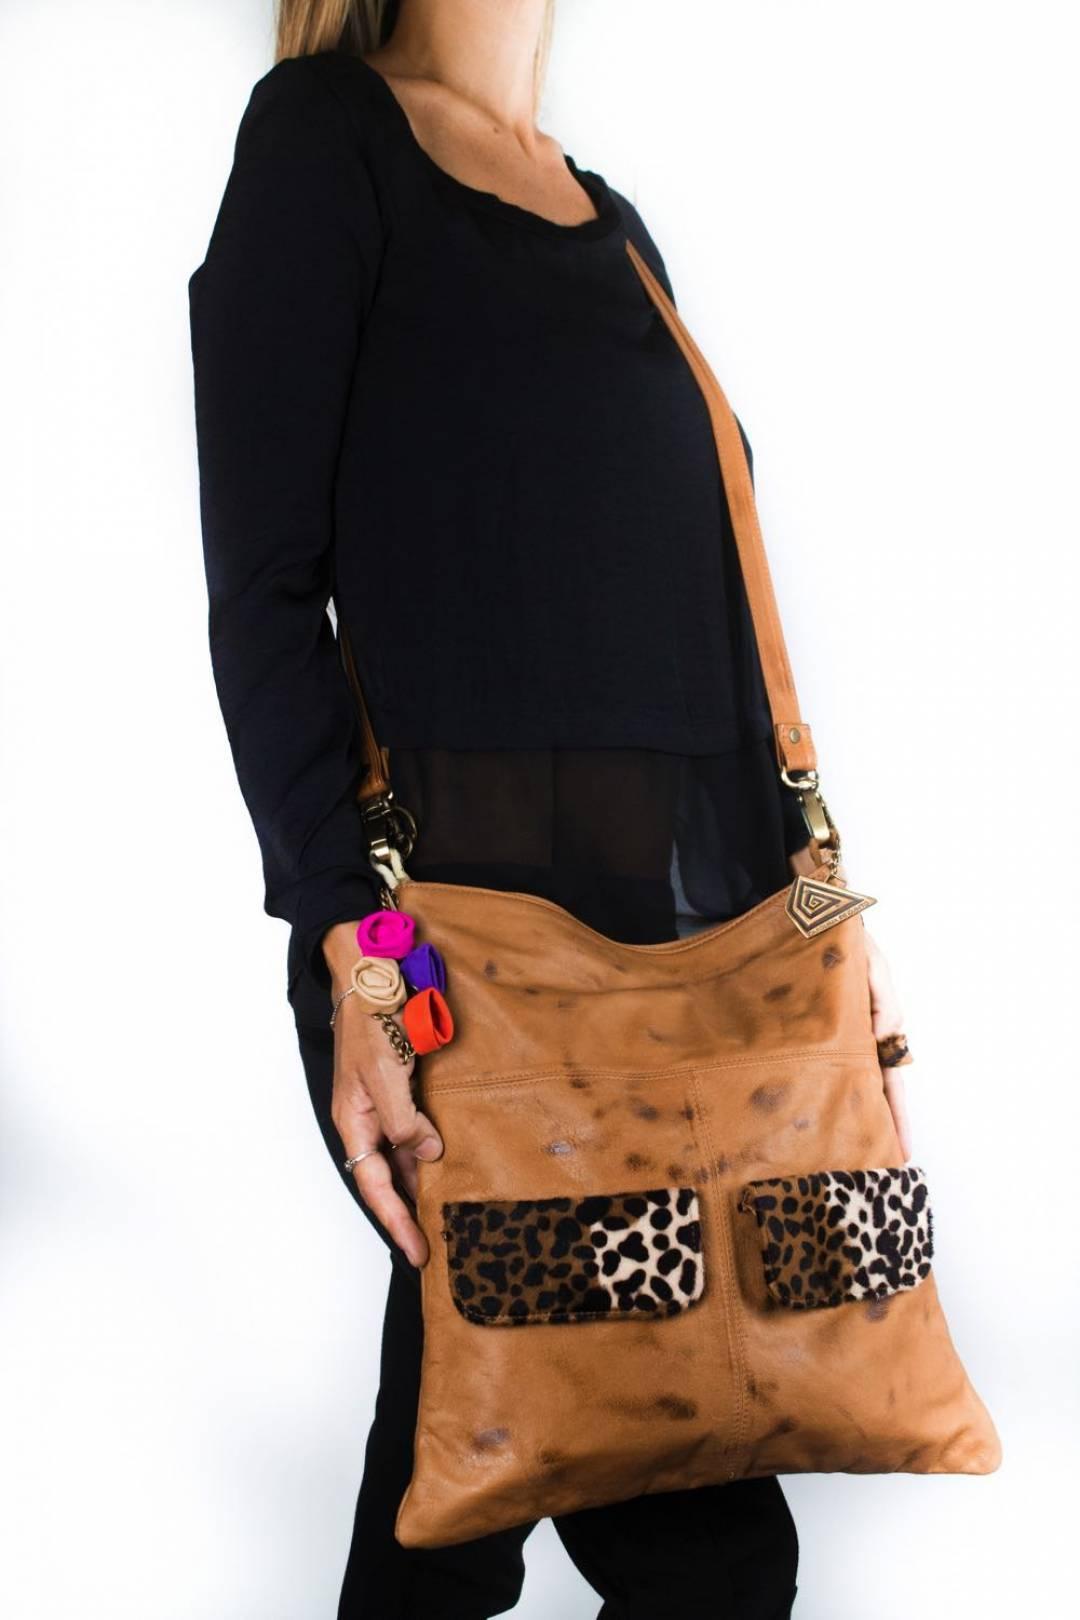 Cross body/handbag in leather and animal print pockets.